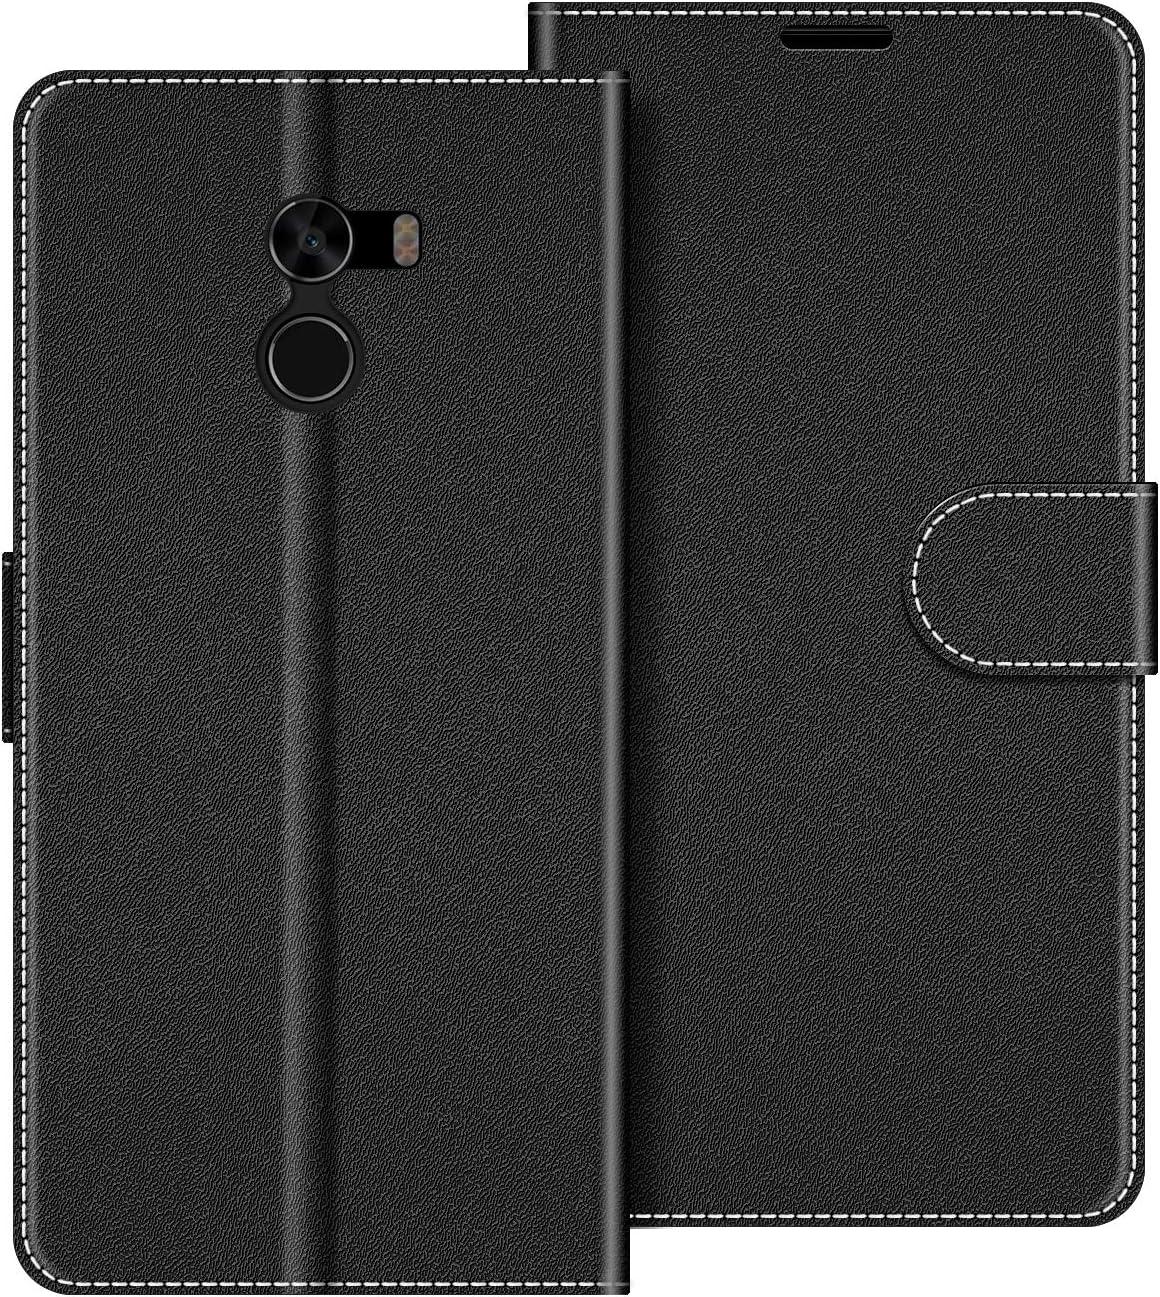 COODIO Funda Xiaomi Mi Mix 2 con Tapa, Funda Movil Xiaomi Mi Mix 2, Funda Libro Xiaomi Mi Mix 2 Carcasa Magnético Funda para Xiaomi Mi Mix 2, Negro